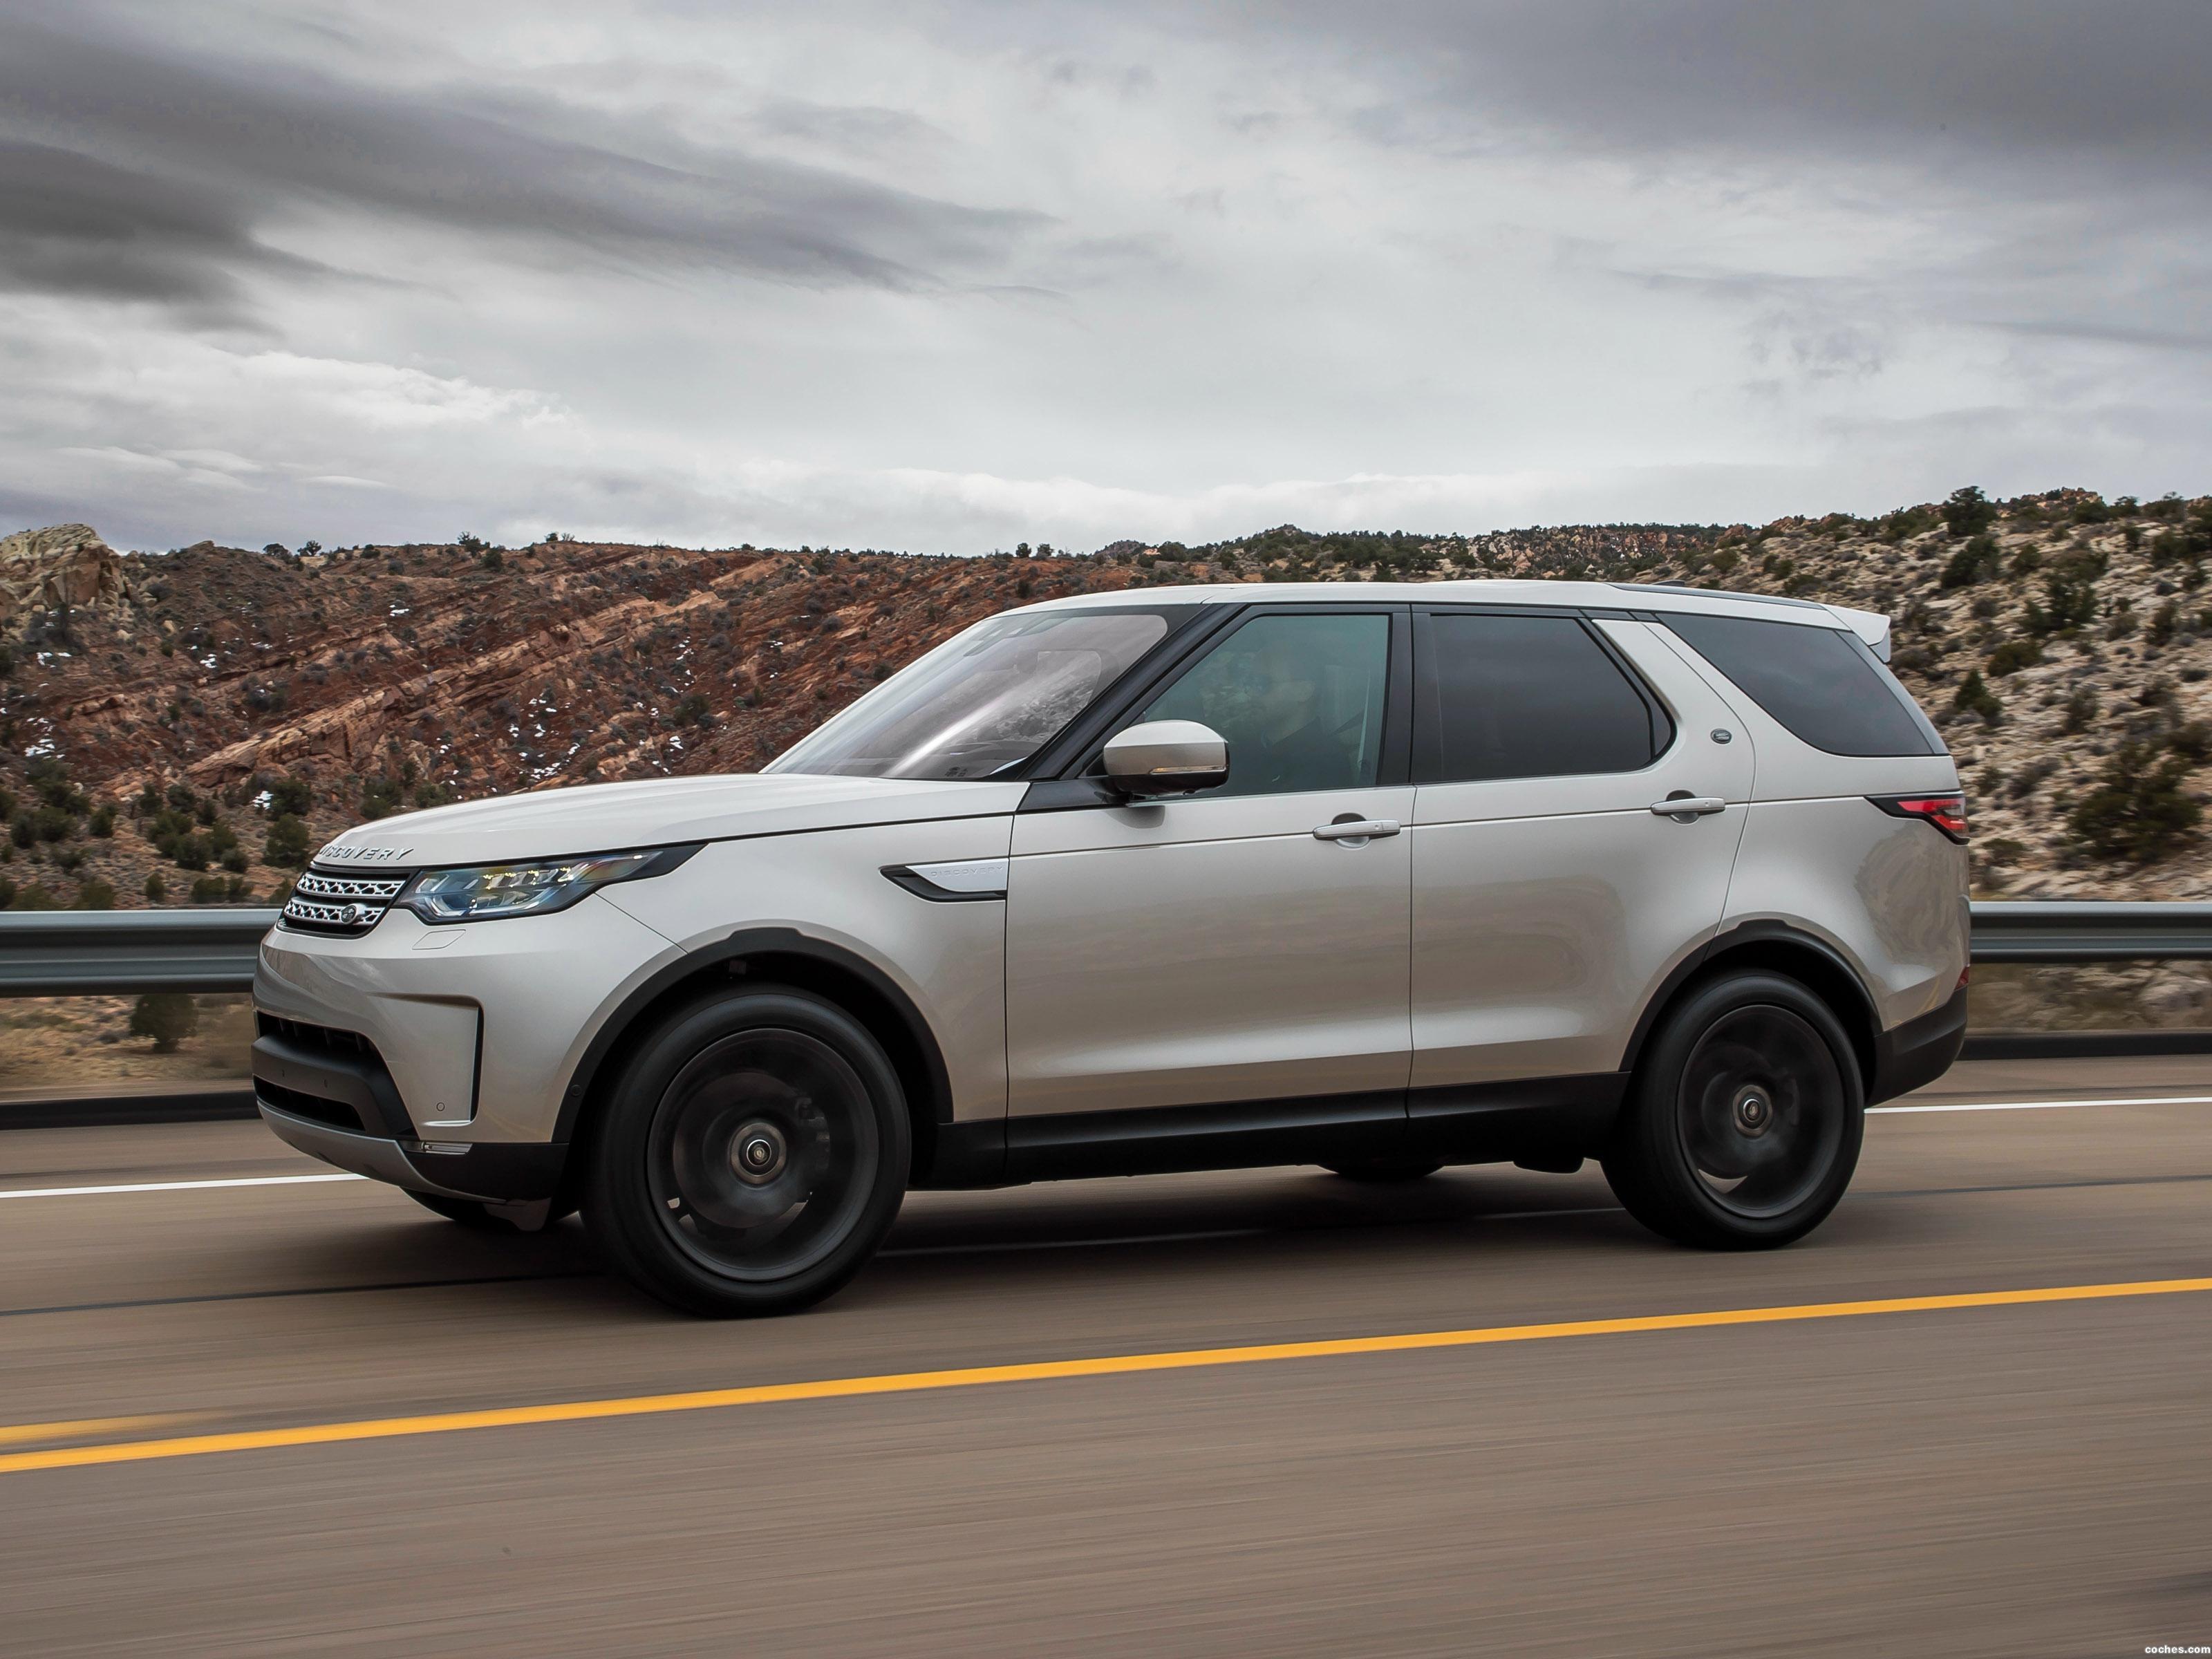 Foto 23 de Land Rover Discovery HSE 2017